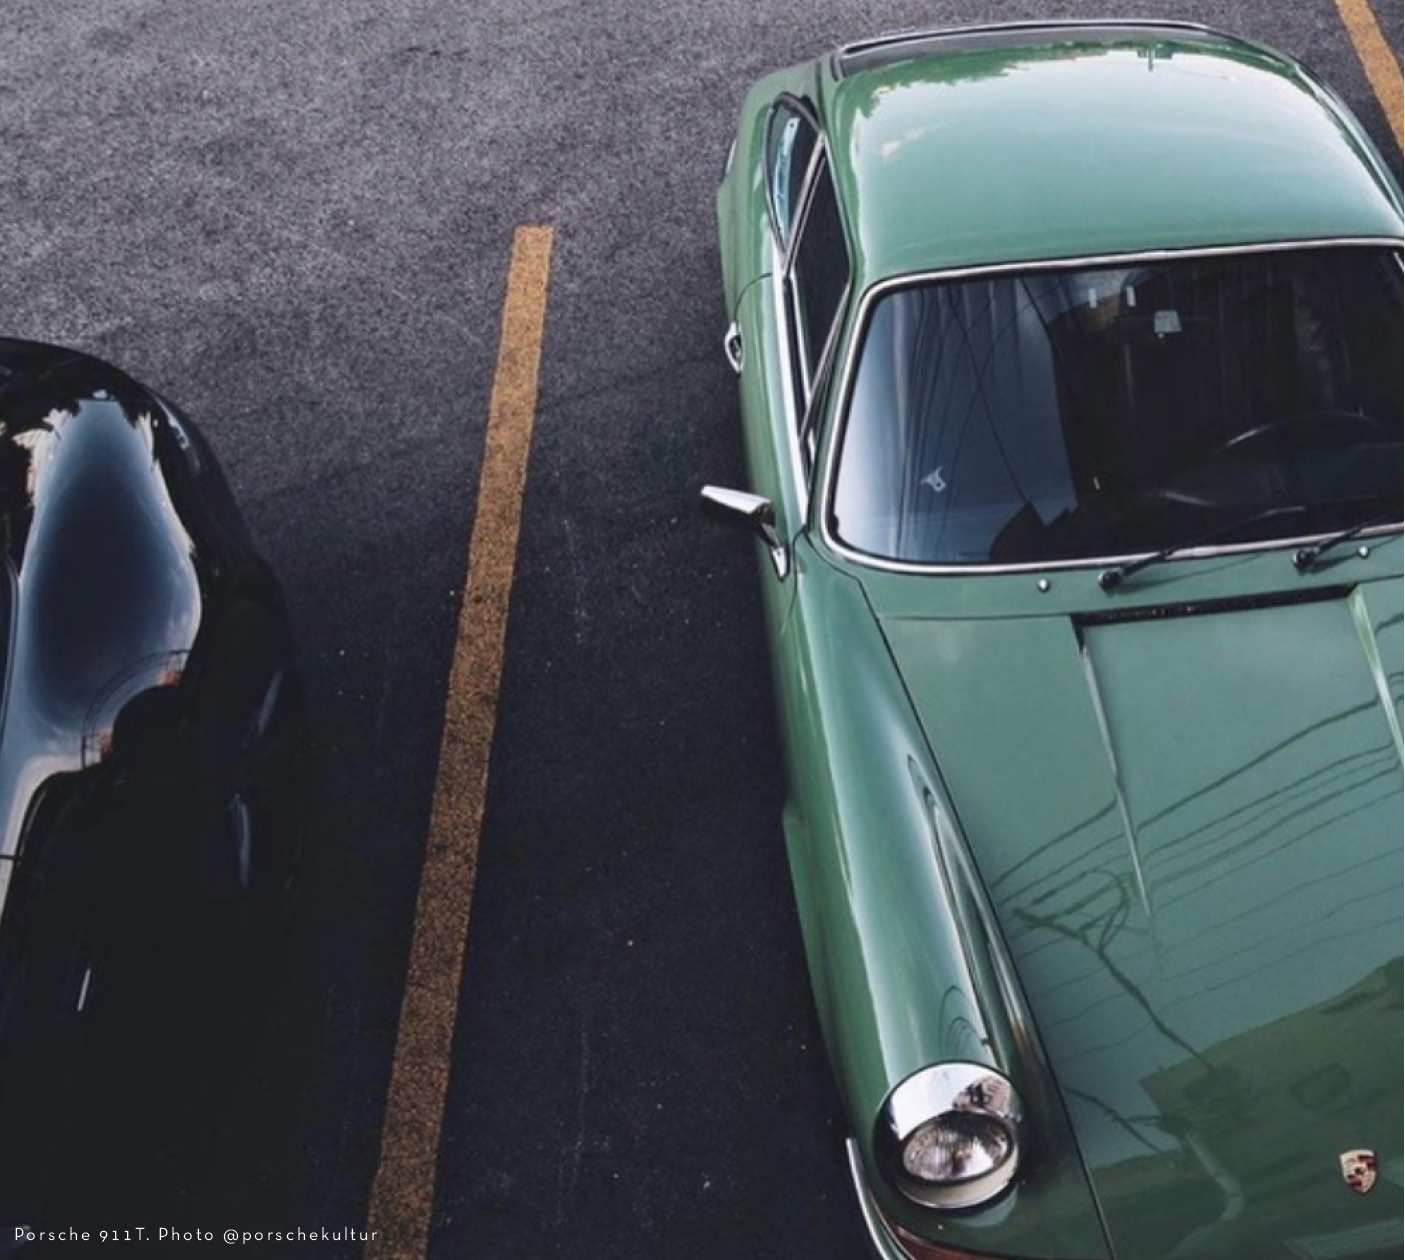 Porsche 911T in Irish Green - Colour Inspiration